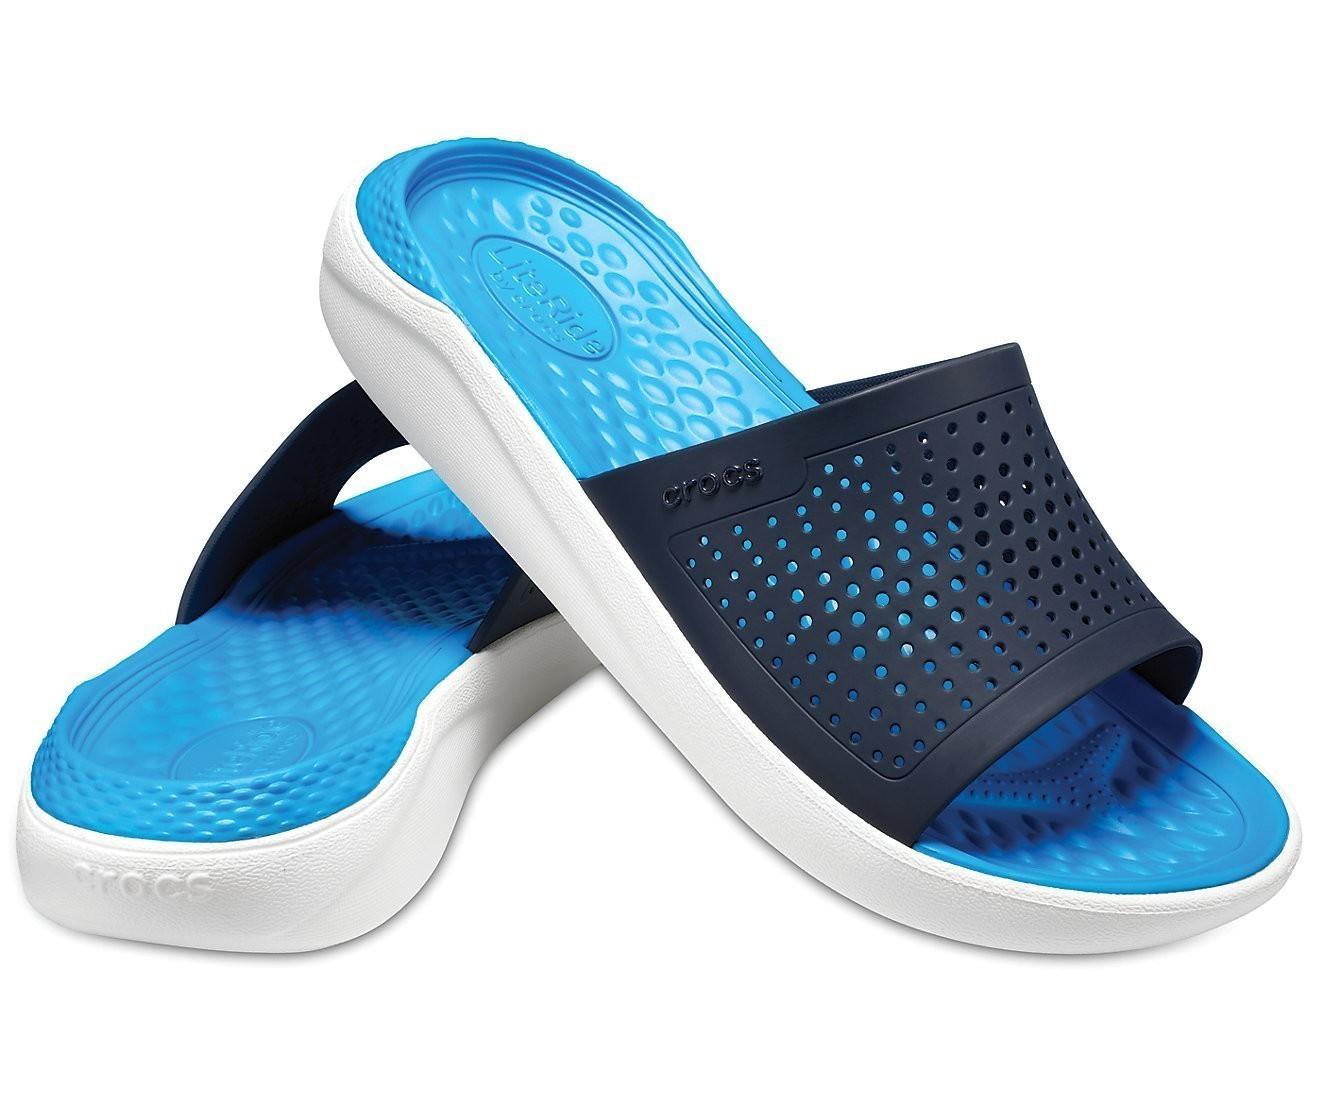 Chinelo Crocs Literide Slide